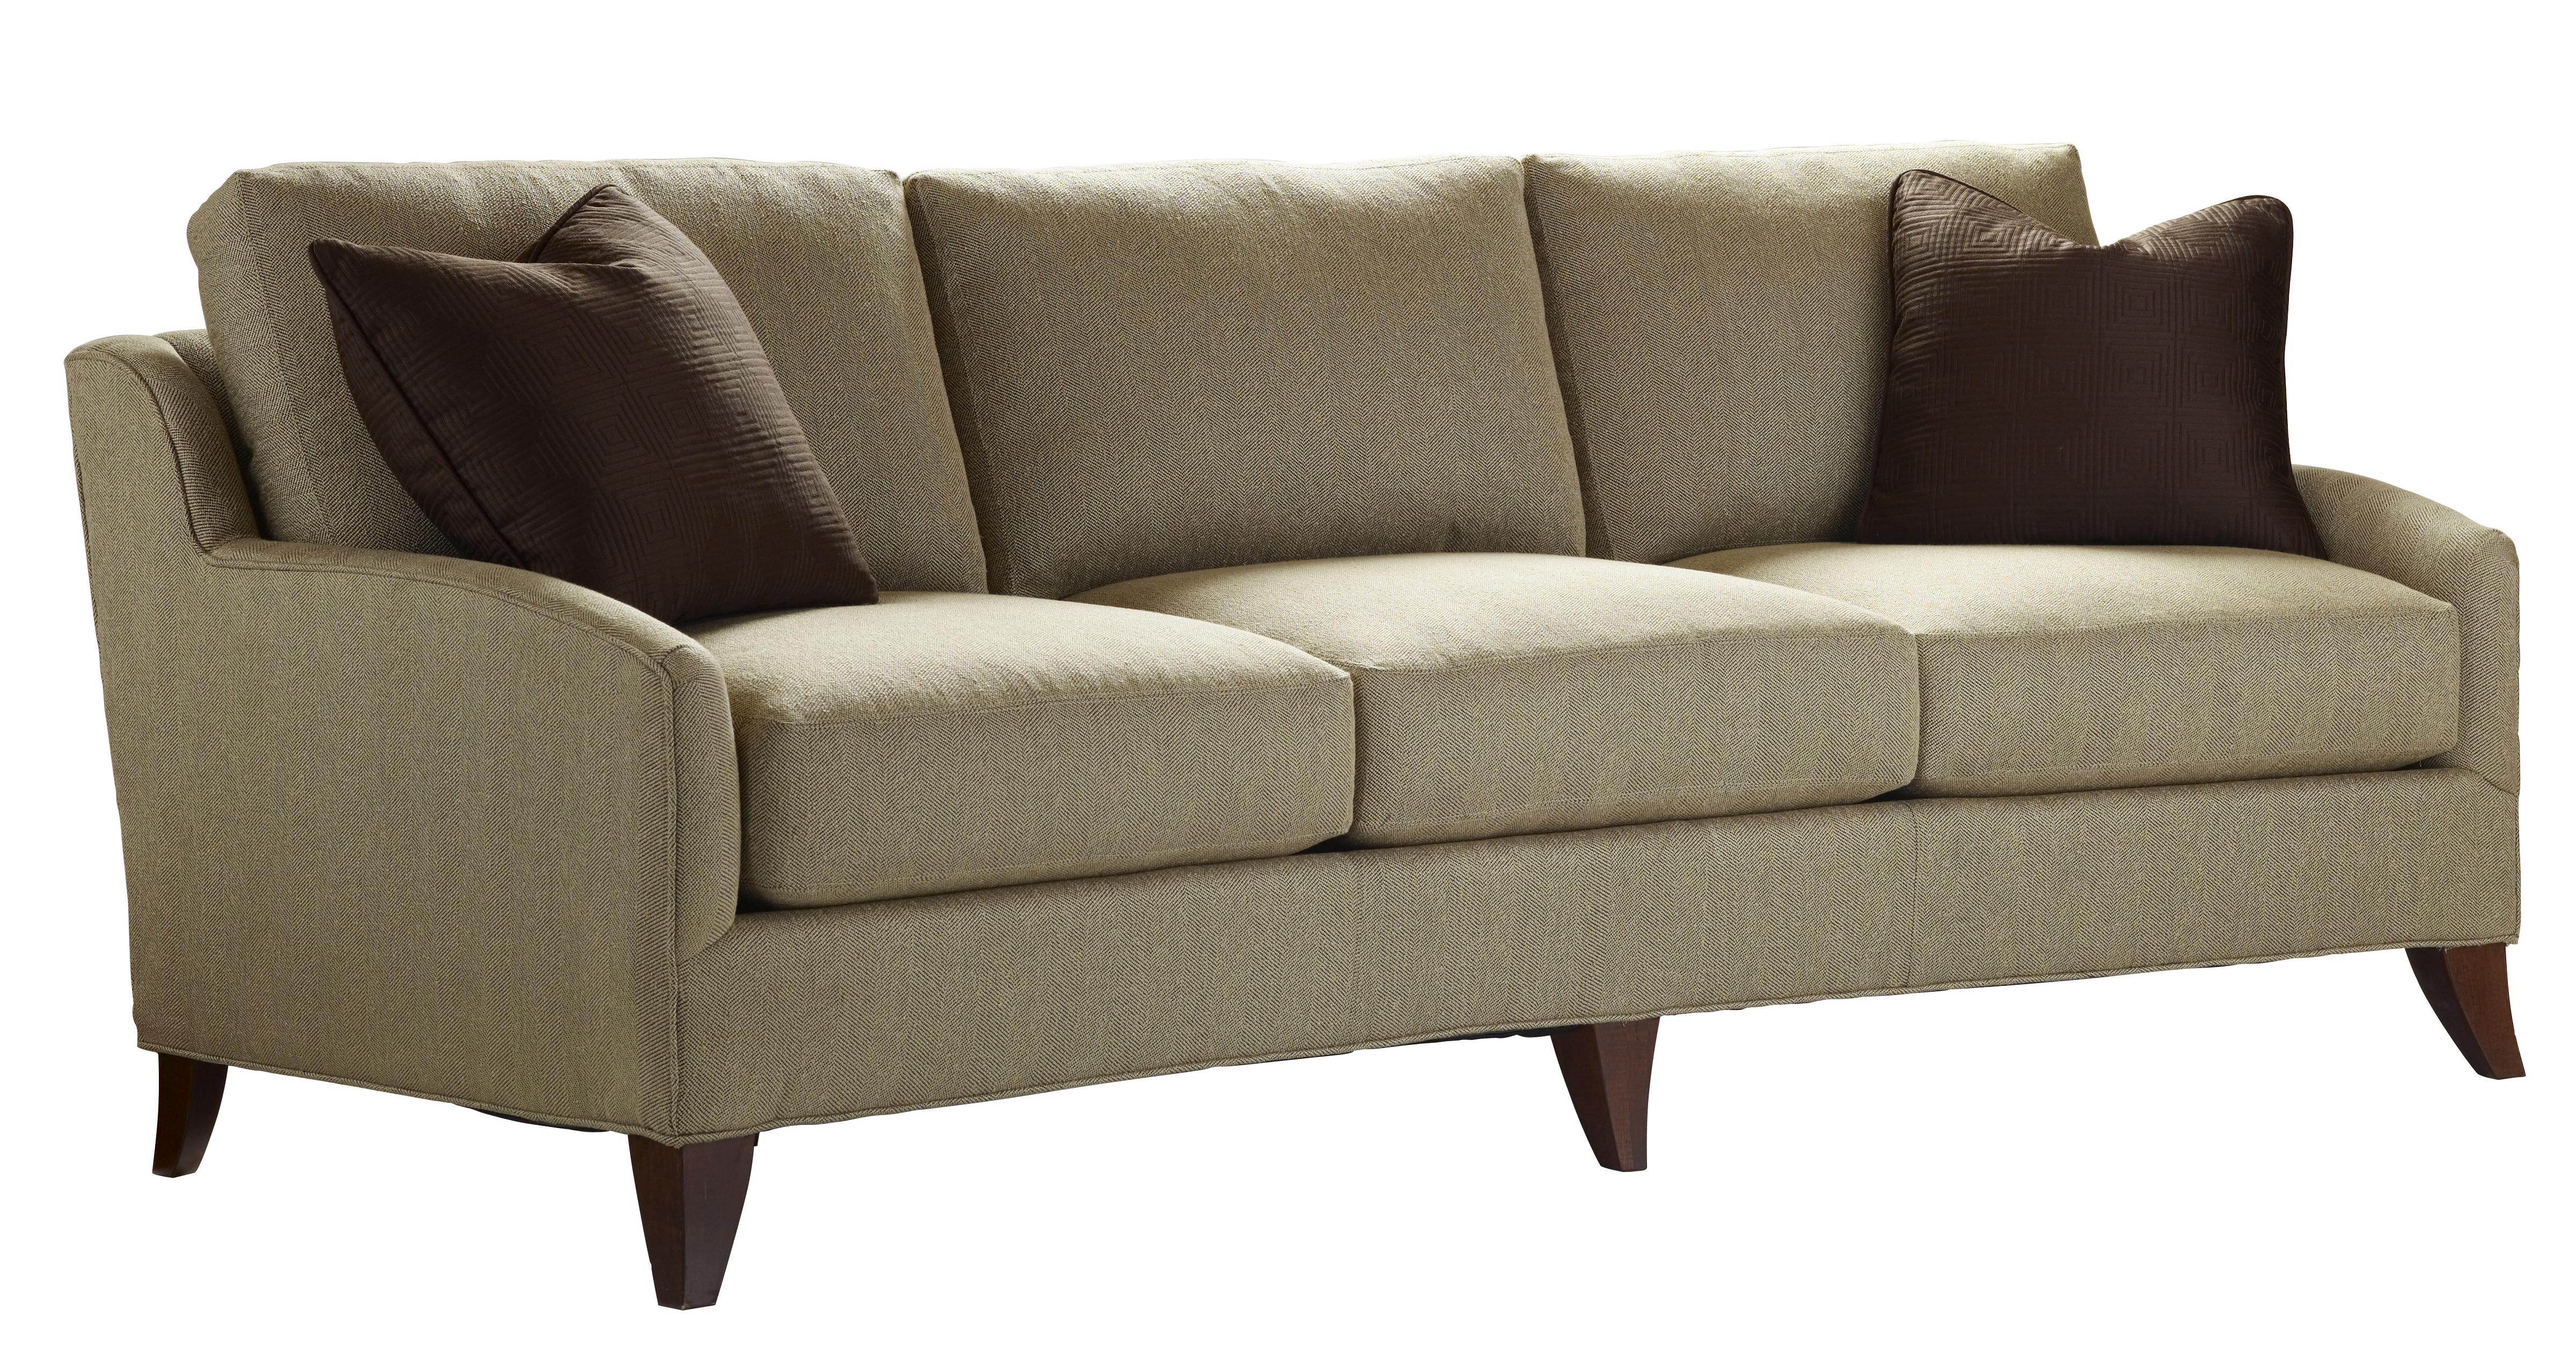 Highland House Furniture 4168 98 Sofa